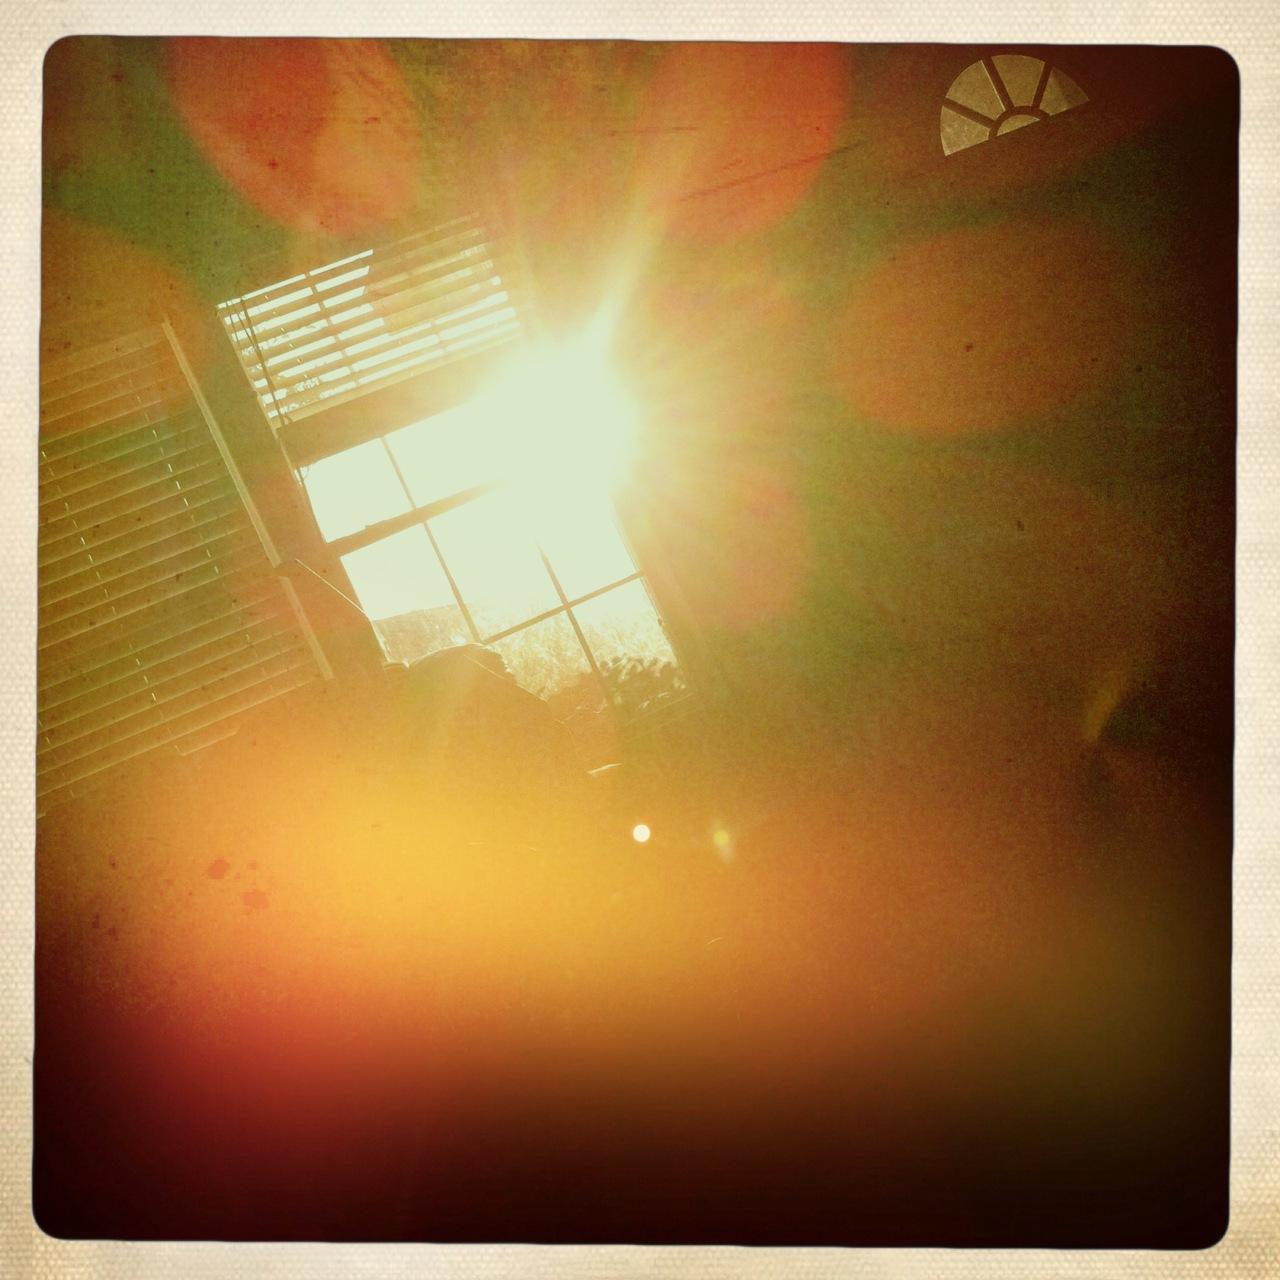 Good morning sunrise through my window 4 Buckhorst H1 Lens, Ina's 1969 Film, Dreampop Flash,